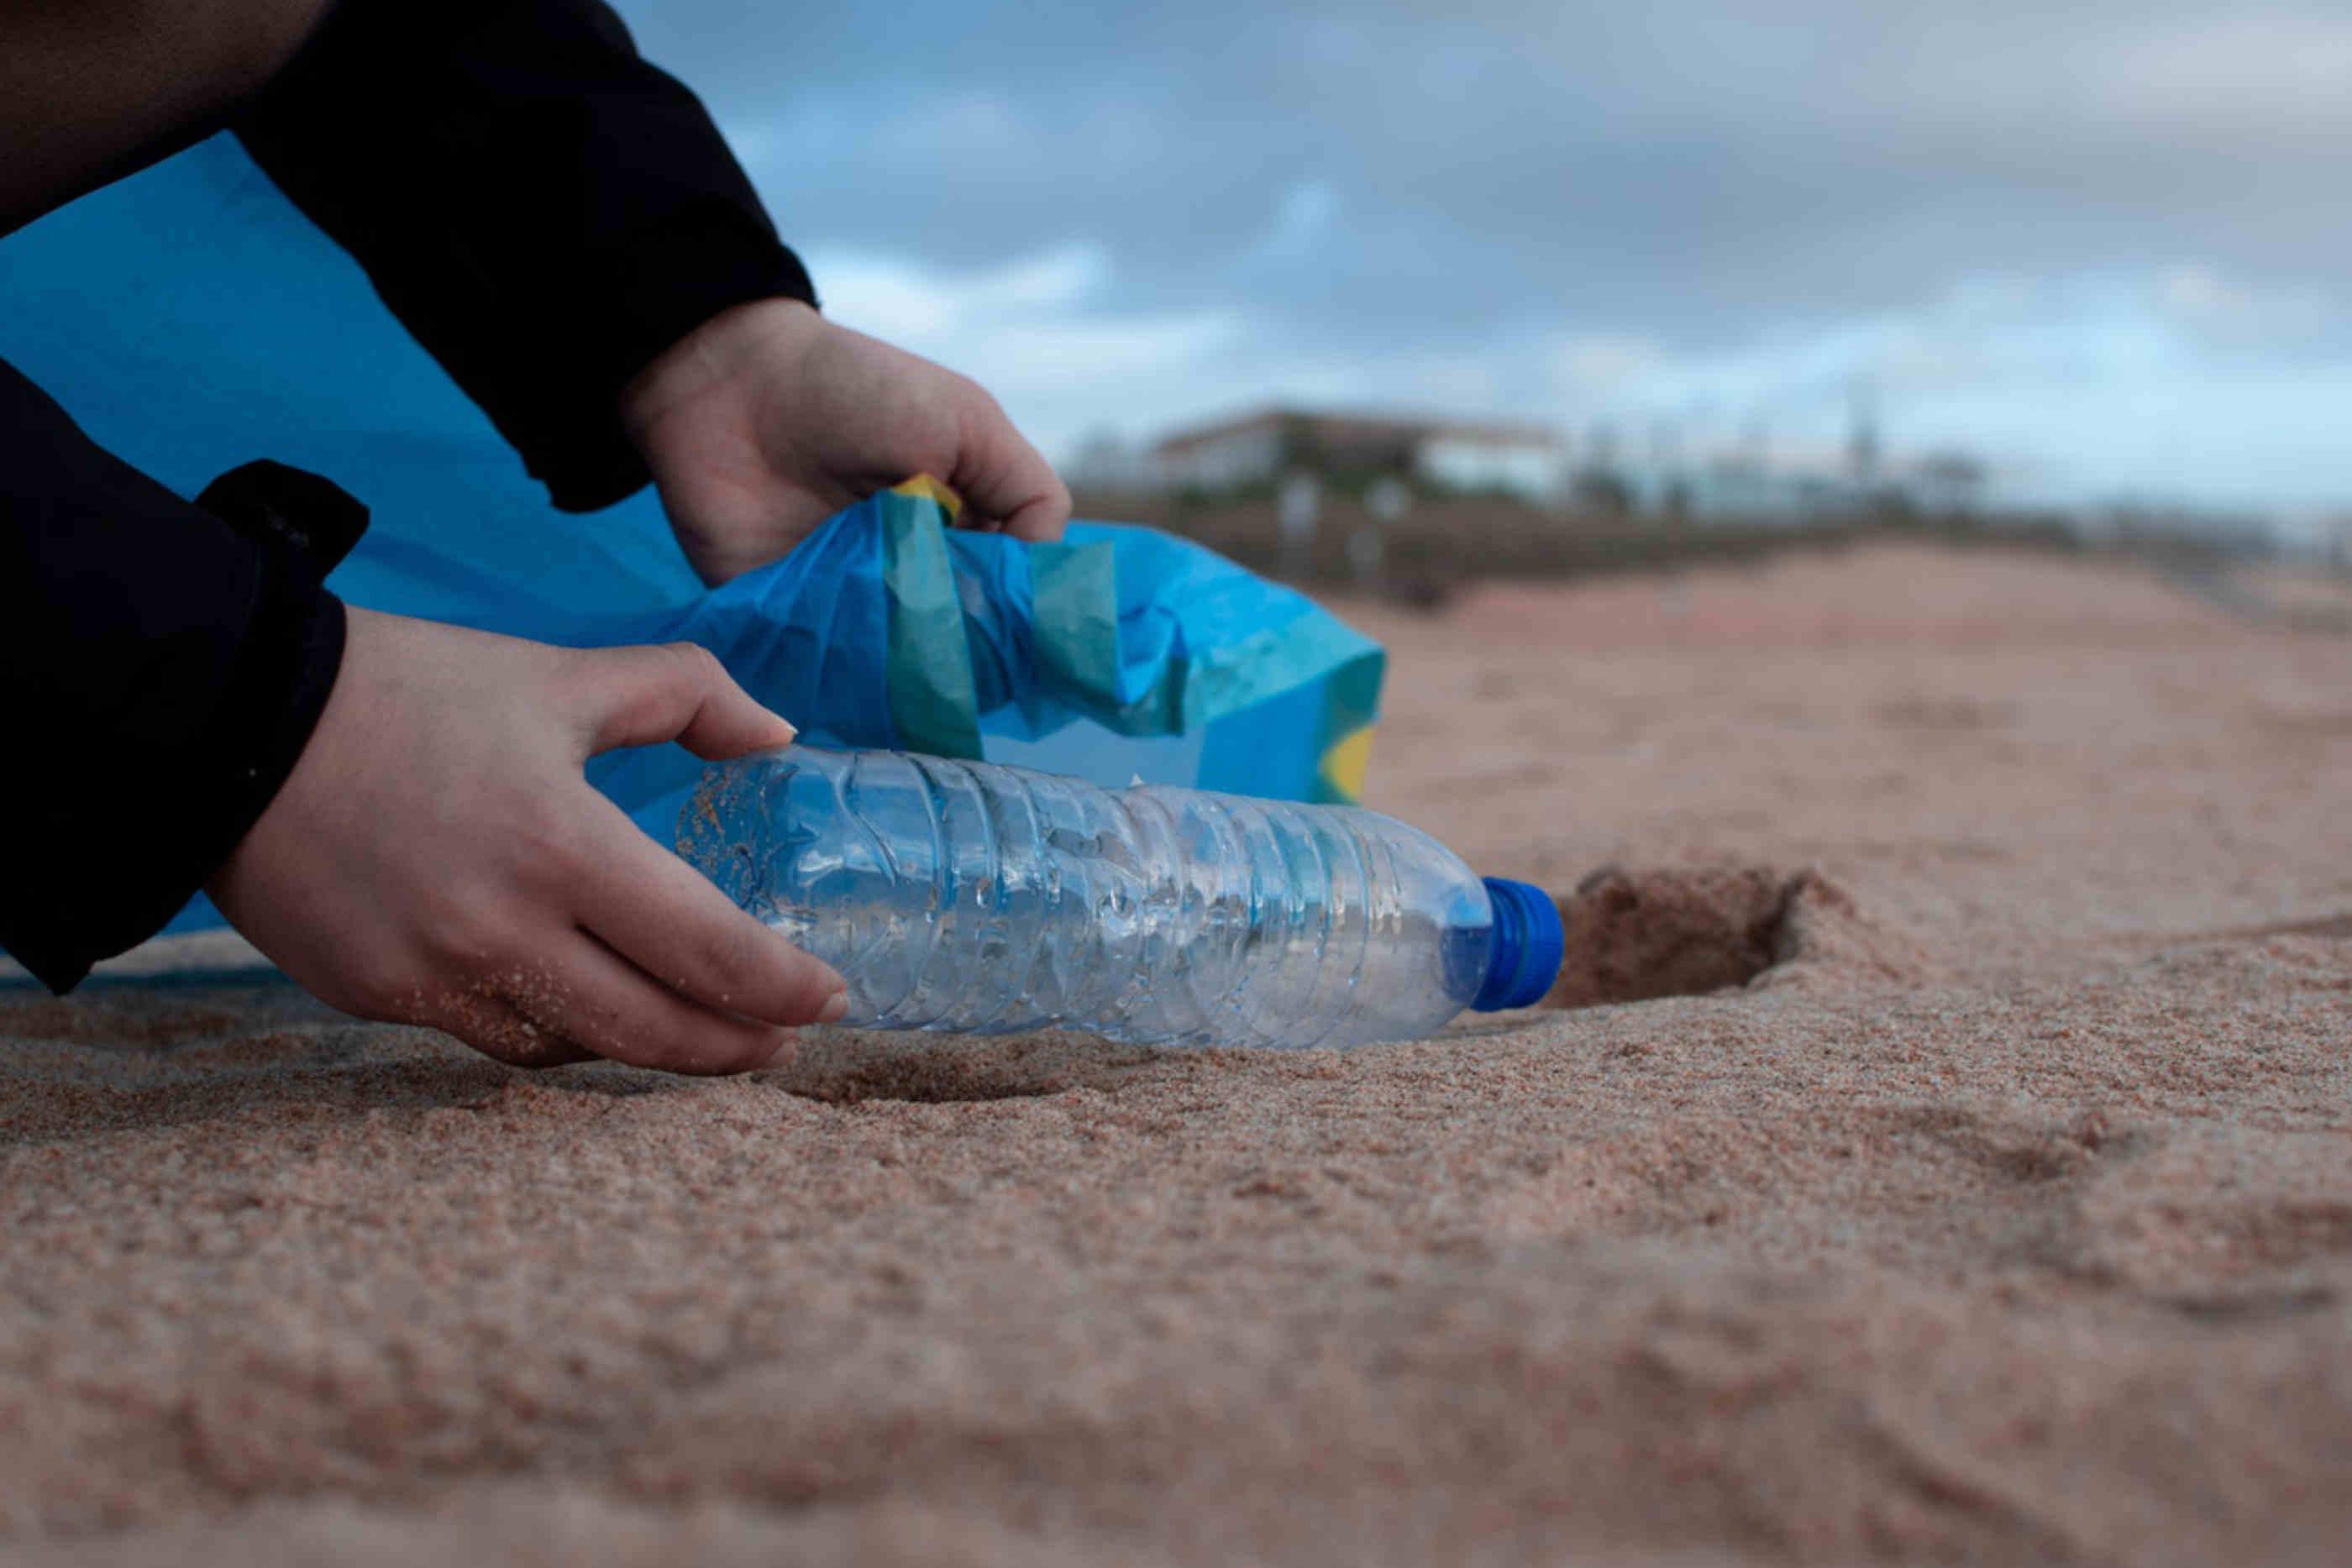 Pessoa colocando garrafa de agua no lixo